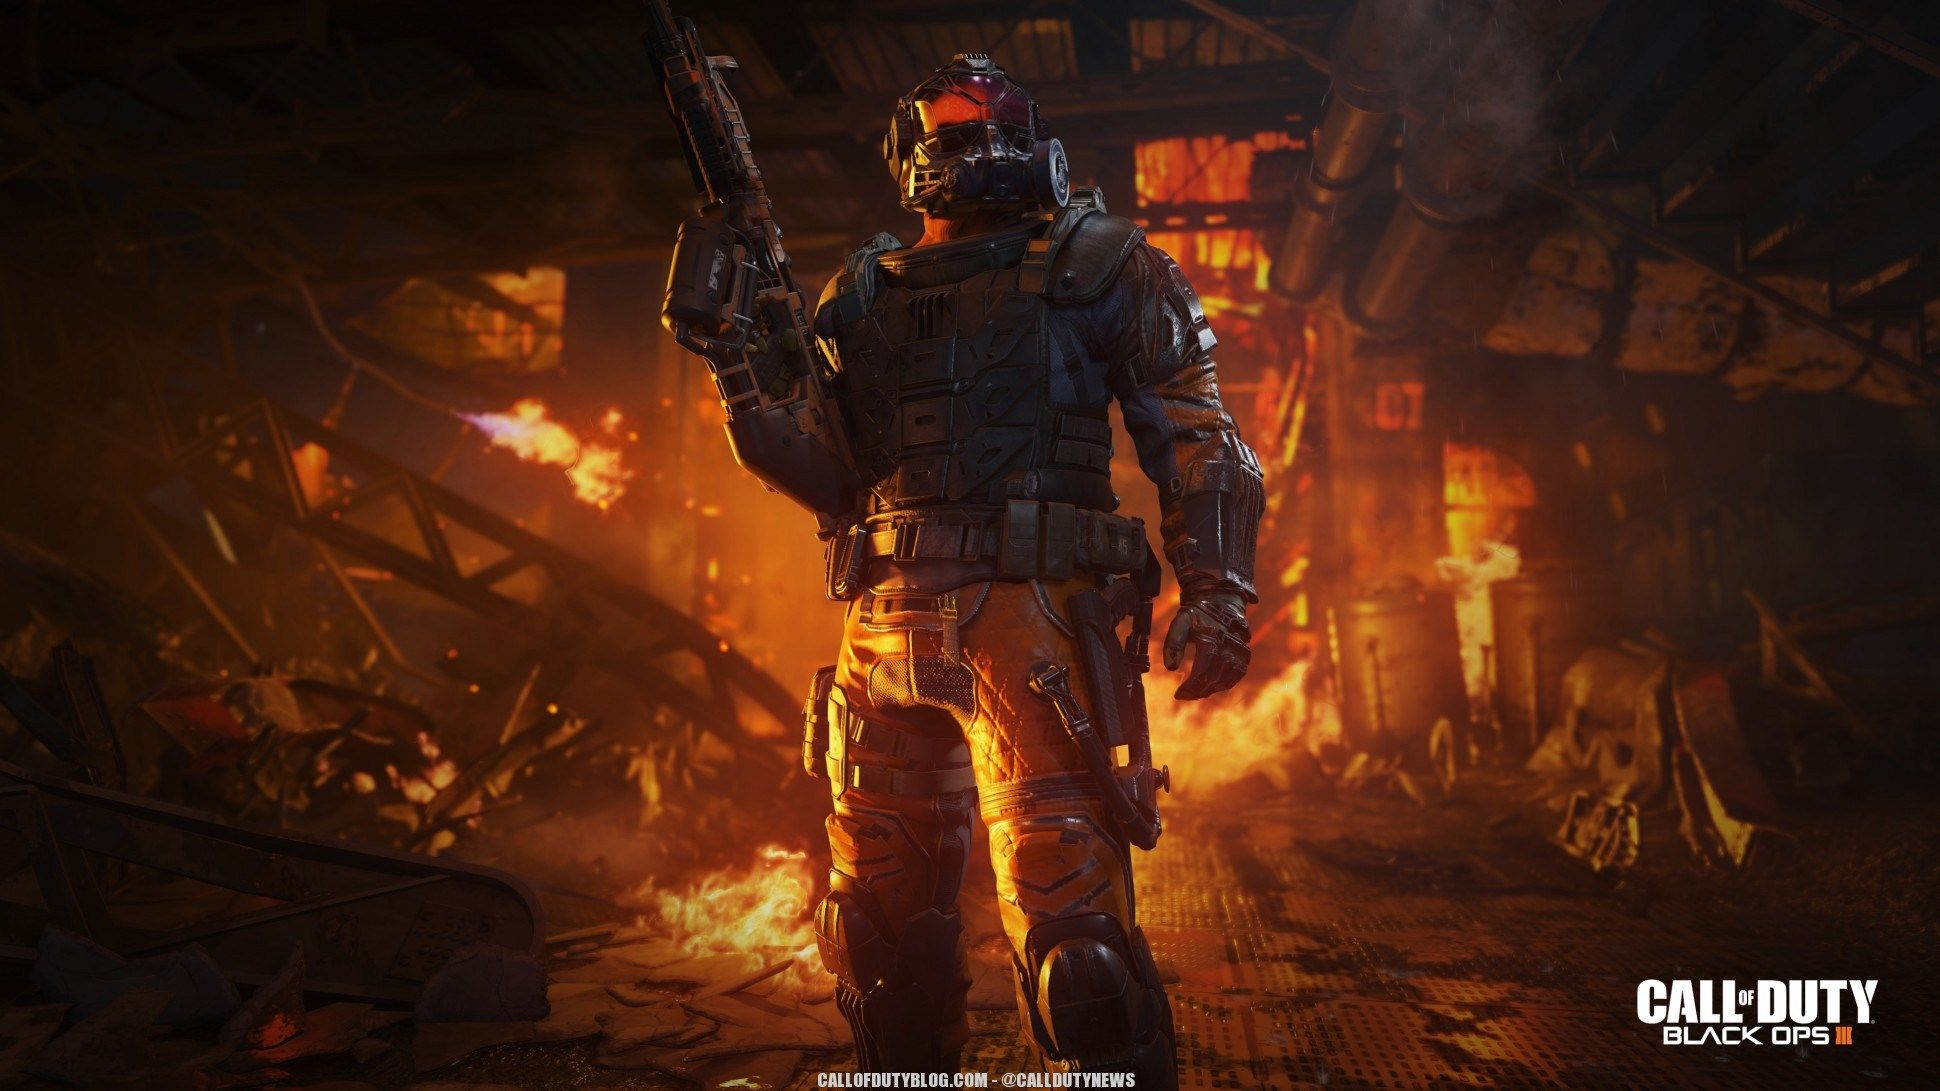 Firebreak Voice Clips Black Ops 3 Call Of Duty Blog Call Of Duty Black Ops 3 Call Of Duty Black Ops Iii Black Ops